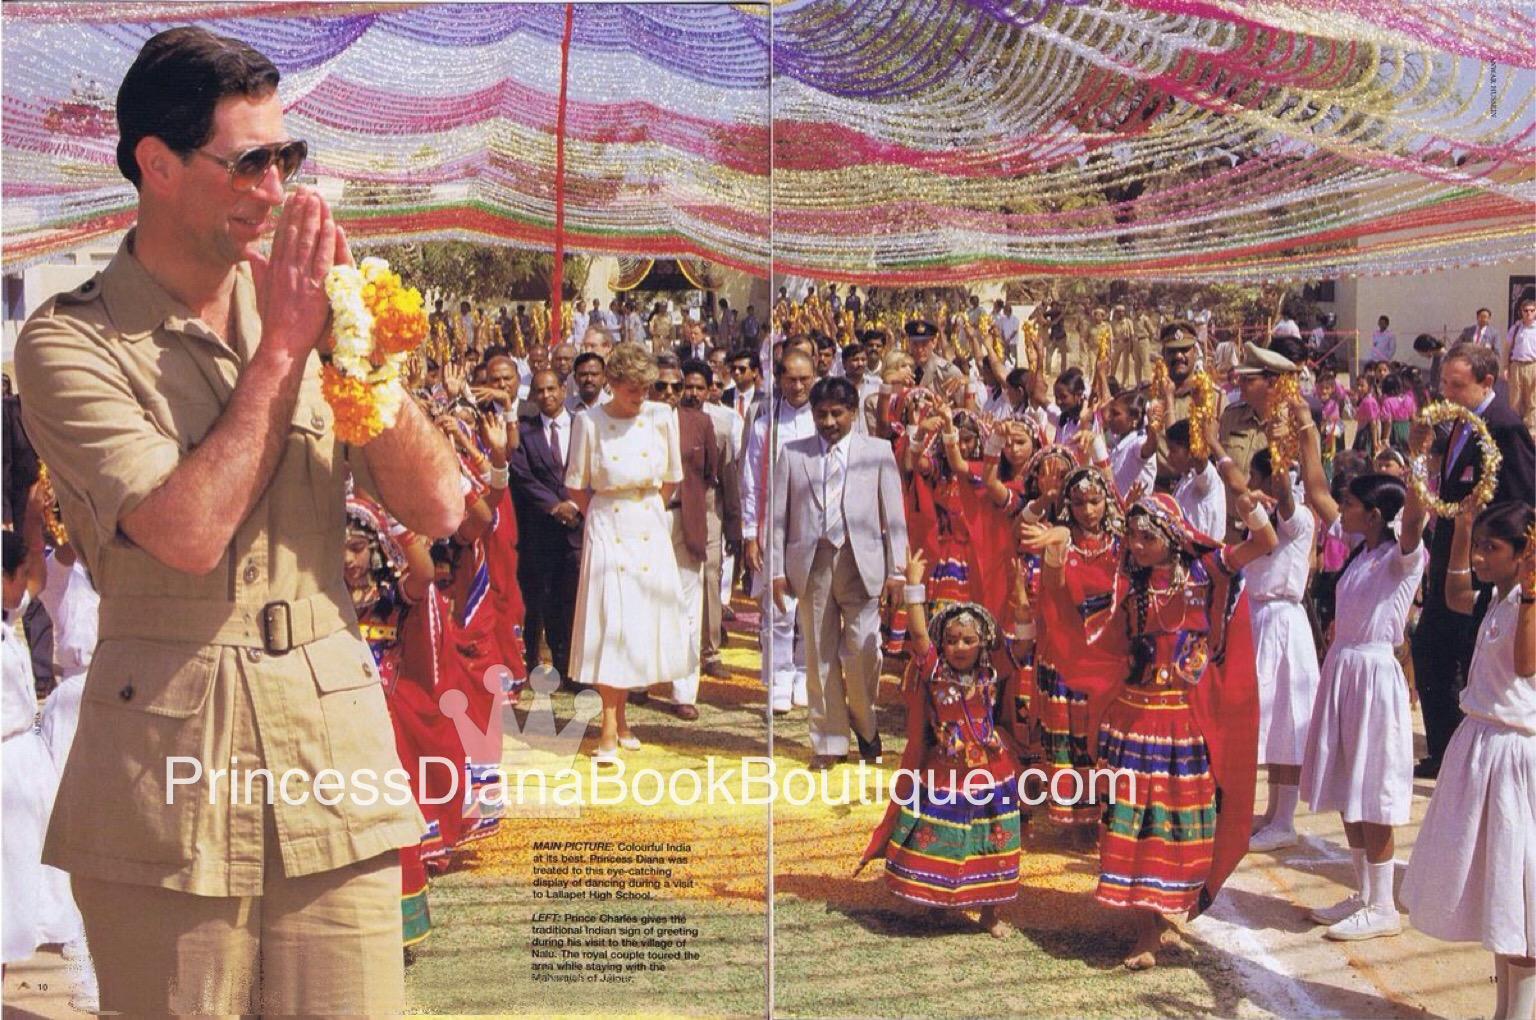 As The Duke Duchess Of Cambridge Tour India We Remember Princess